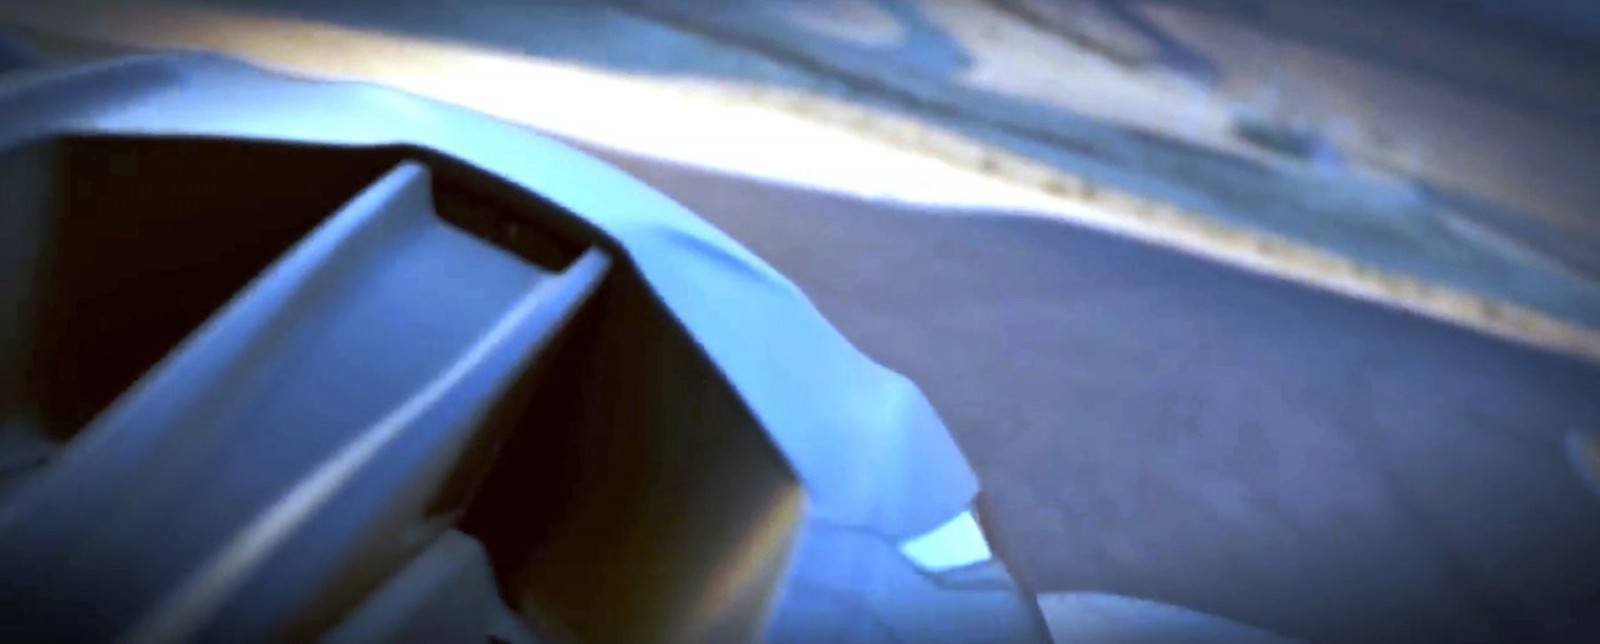 2015 SRT Tomahawk Vision Gran Turismo 7